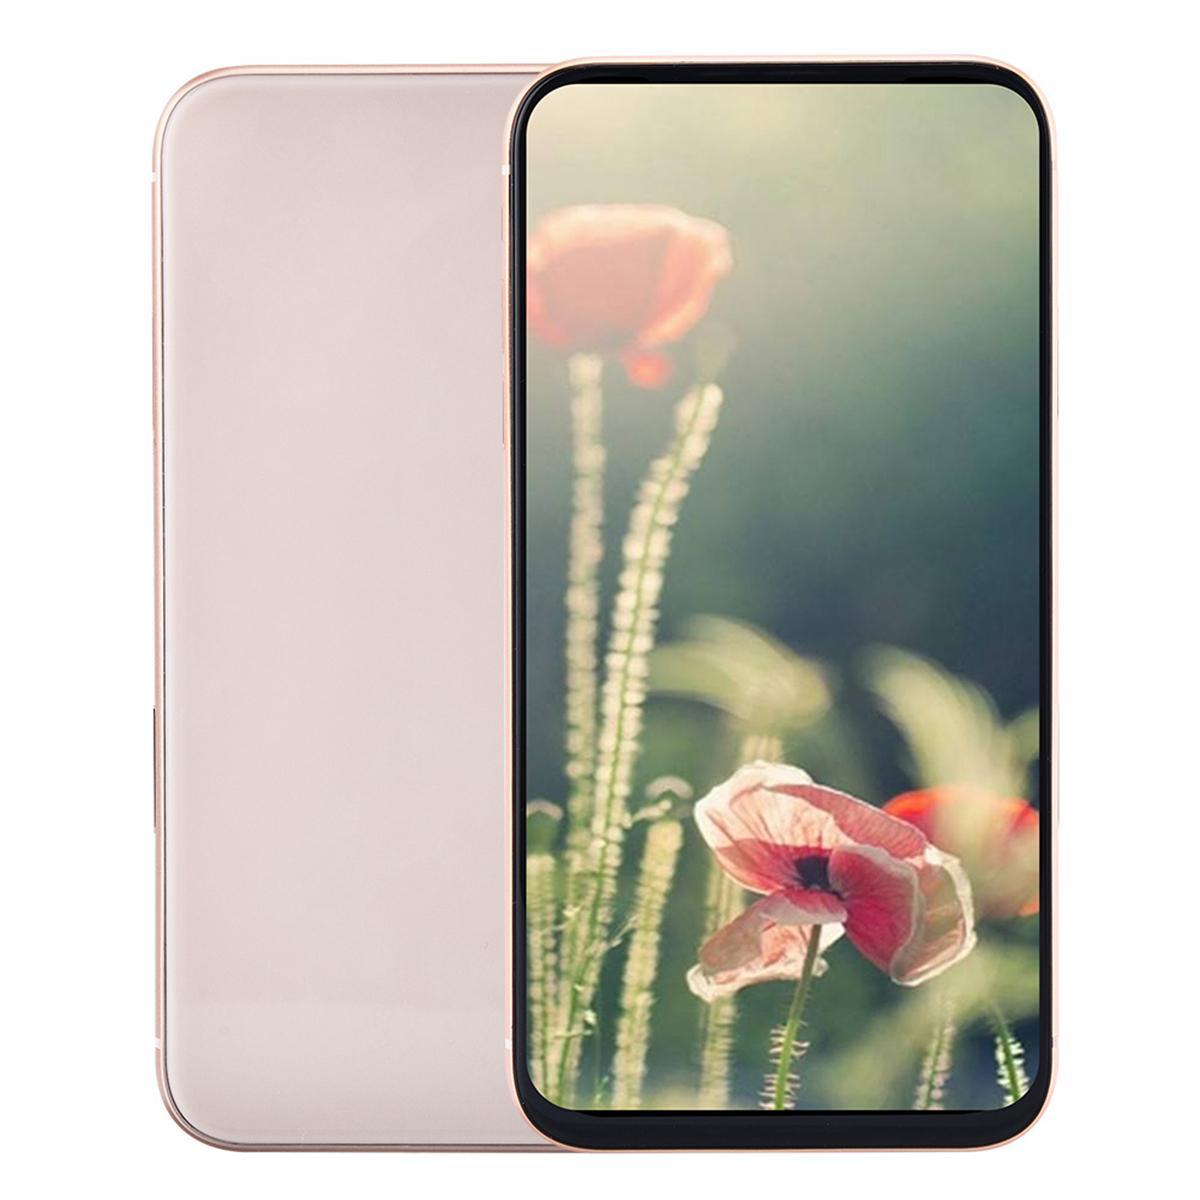 4G LTE I12 PRO MAX 512GB 256GB Smart Phone 64-Bit Octa Core MTK6753 2 ГБ 16 ГБ + 32 ГБ 6,7 дюйма Все экран HD + Android OS Личности ID беспроводной зарядки 12MP камеры GPS Smartphone